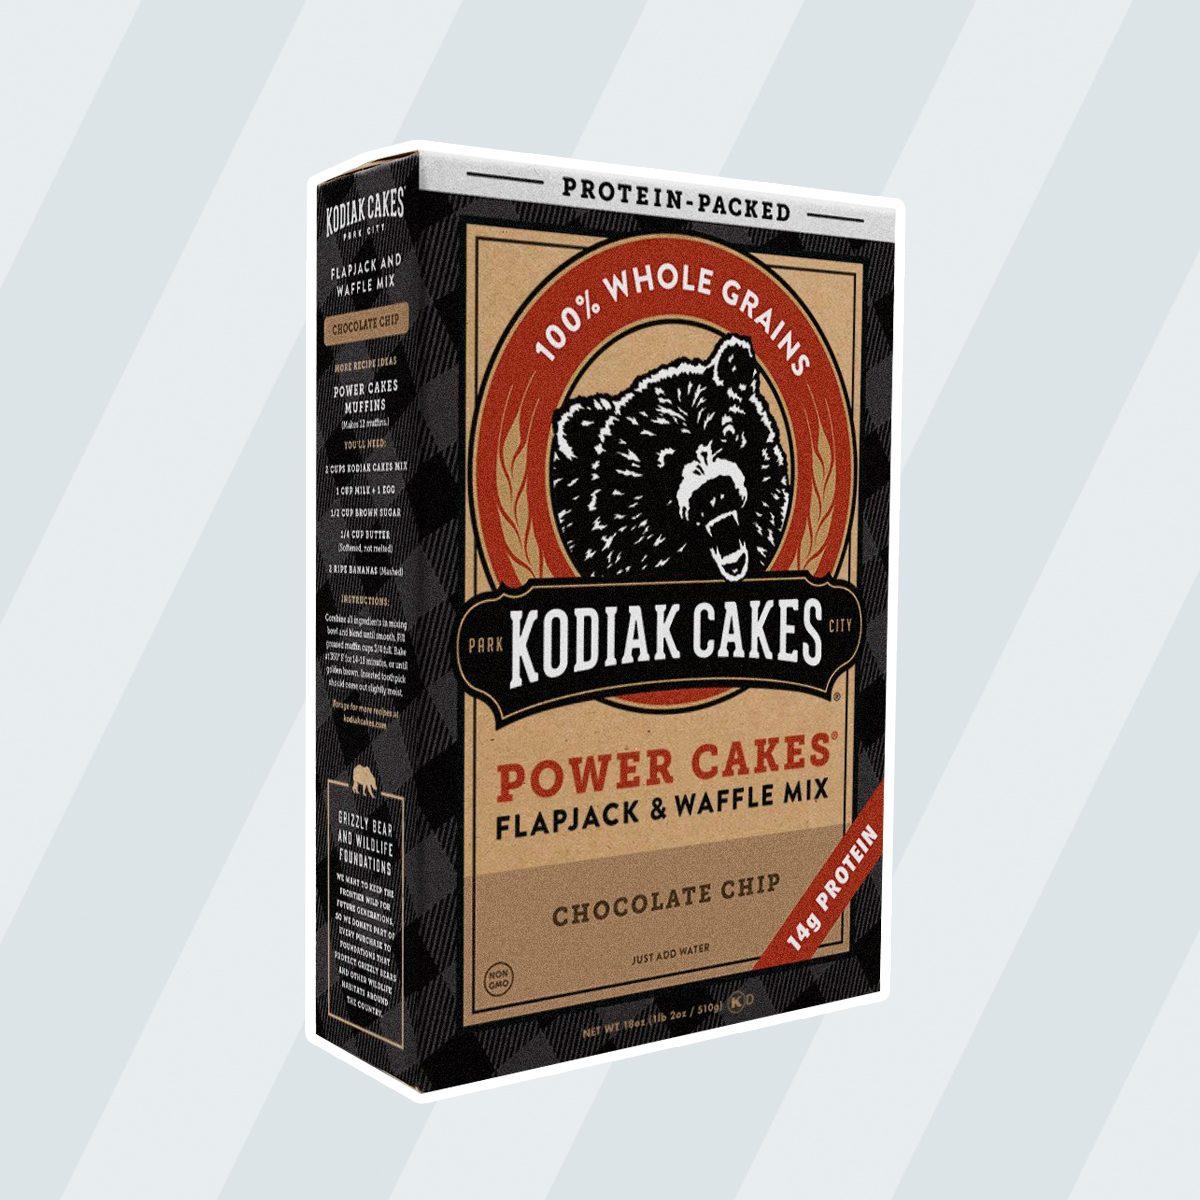 Kodiak Cakes Pancake Power Cakes, Flapjack & Waffle Mix, Chocolate Chip, 18 Ounce